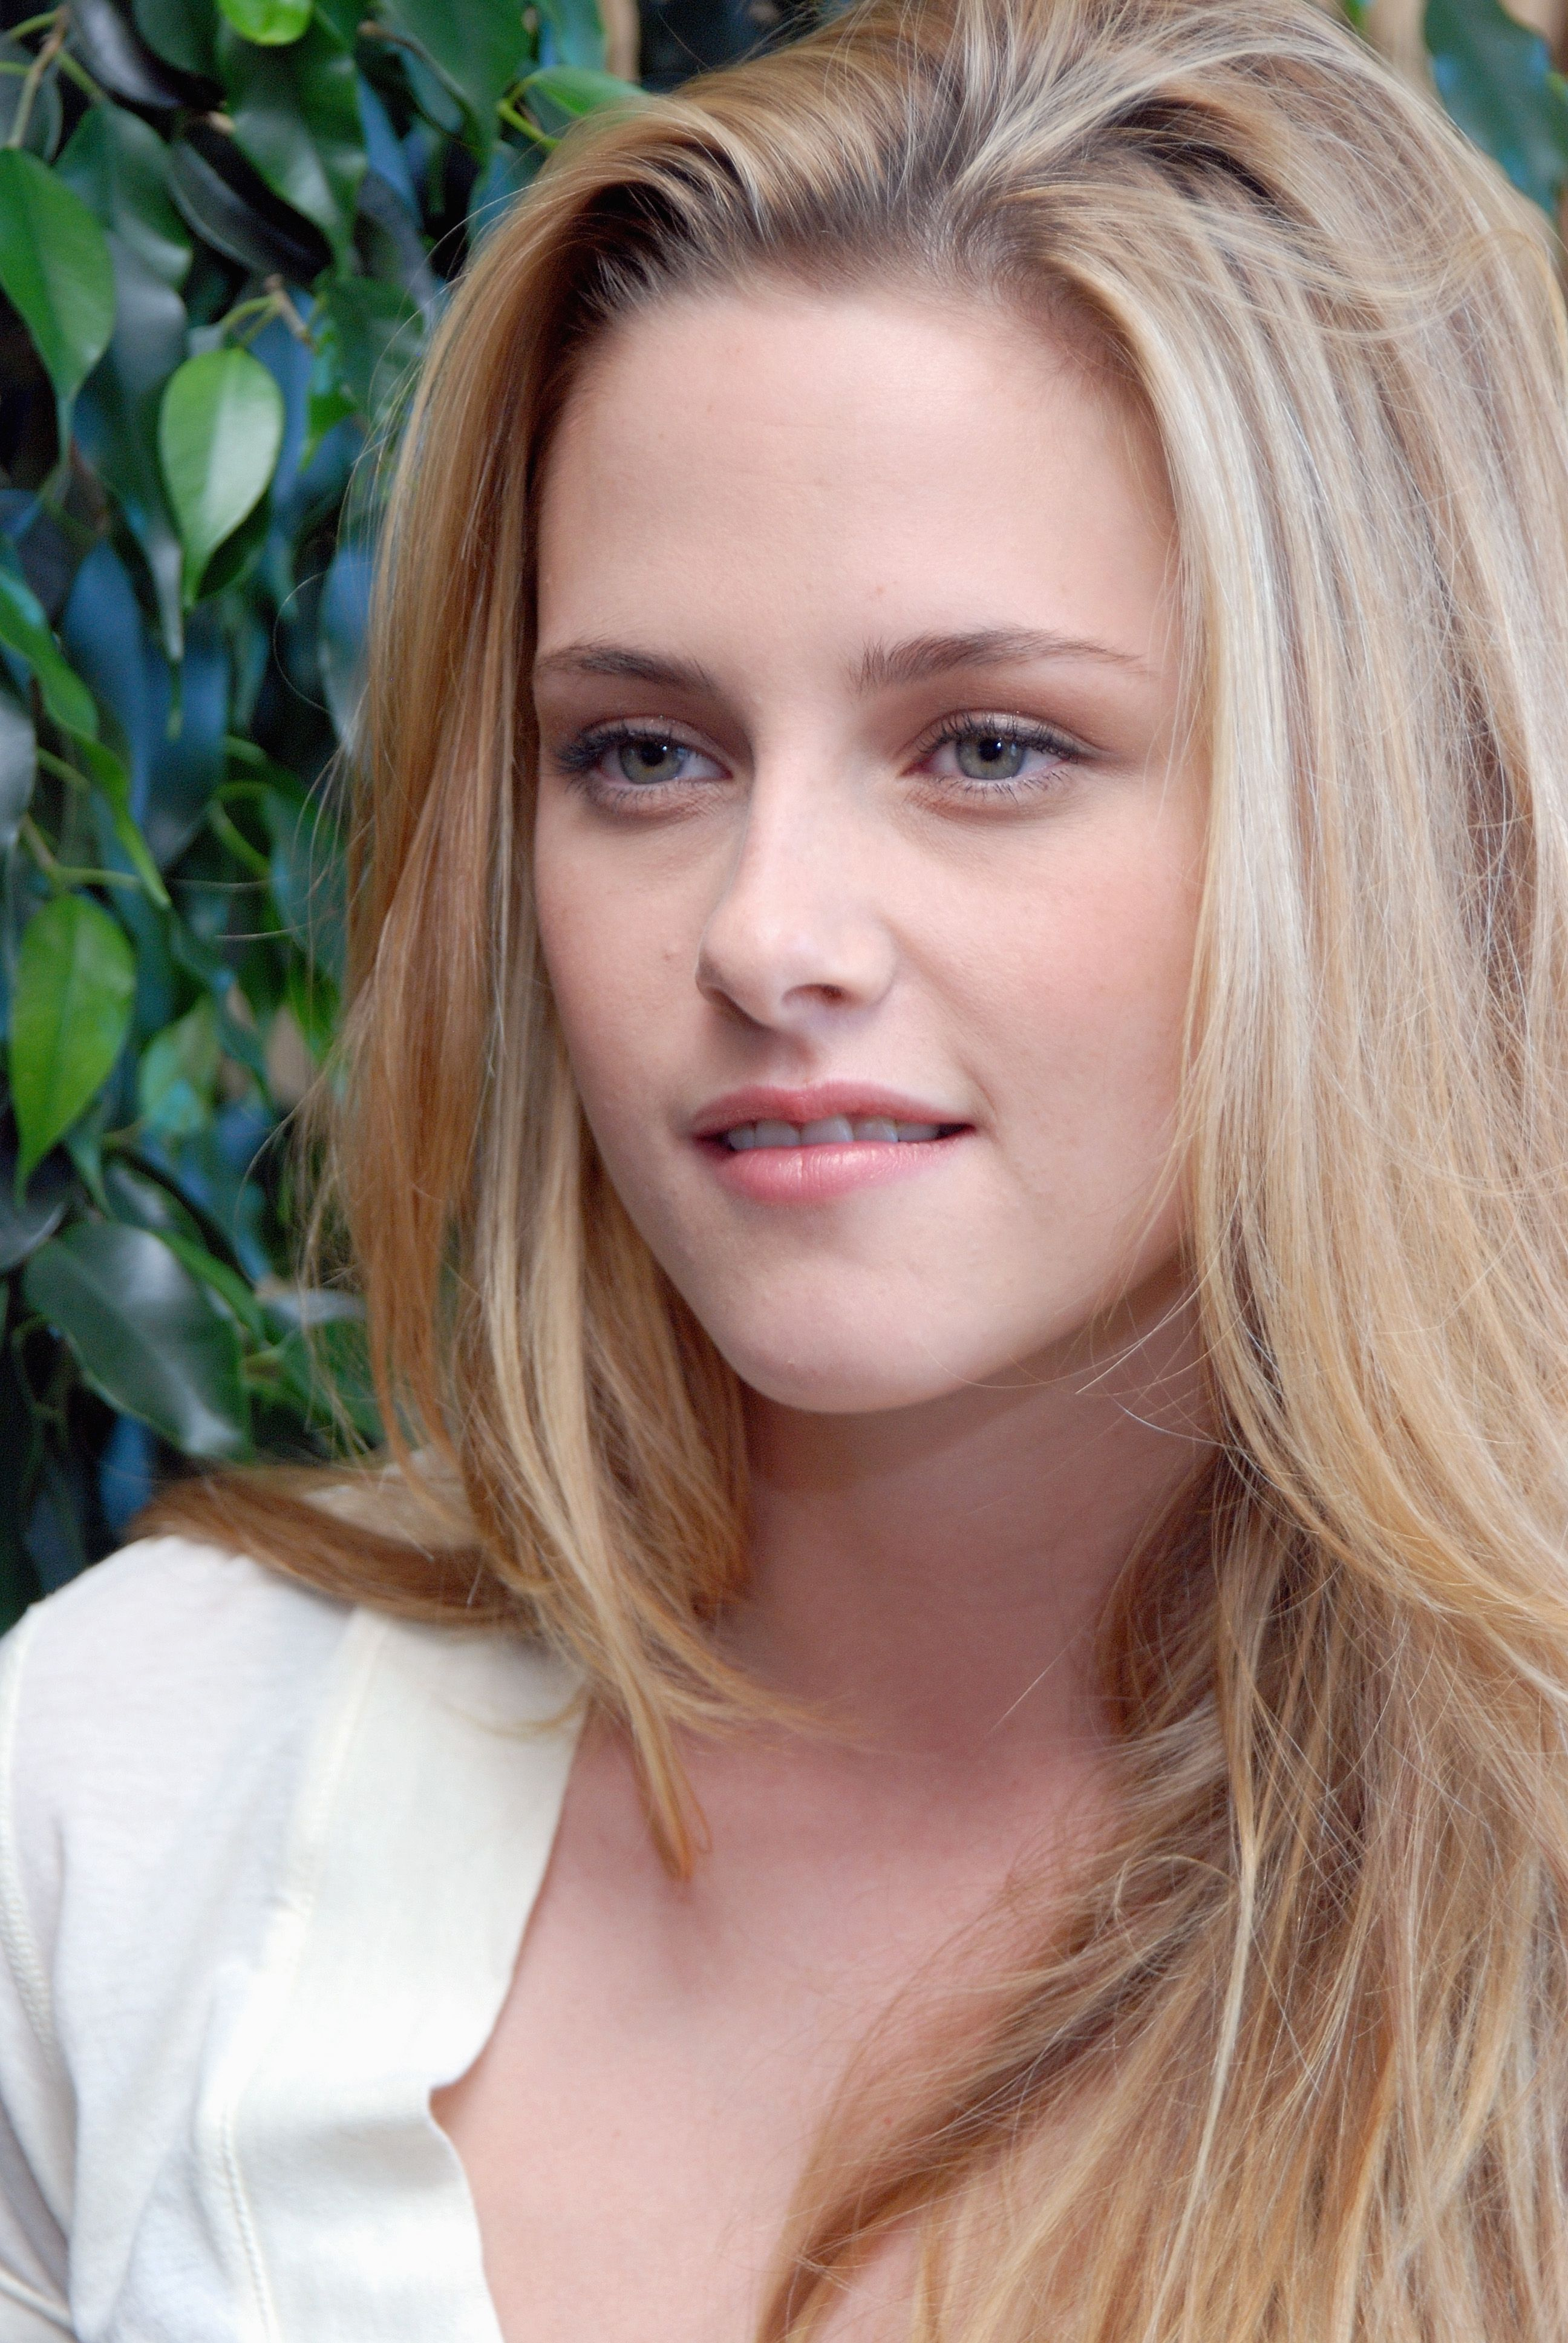 CELEBRITY WOMEN 2016 ) - KRISTEN STEWART(Kristen Jaymes Stewart ...